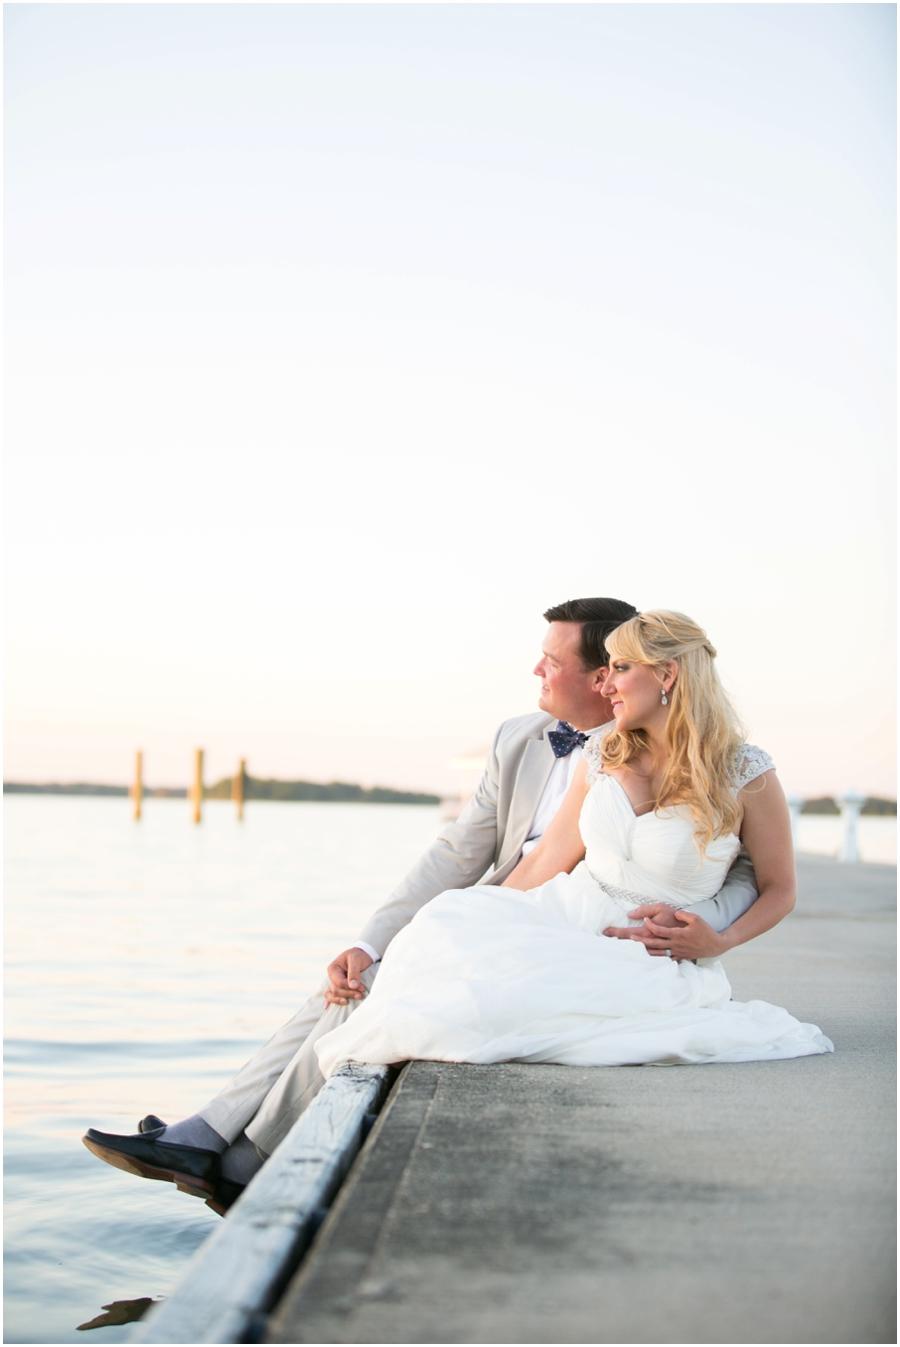 Hyatt Chesapeake Bay Wedding Photographer - Destination Wedding Photography - Seaberry Farms - Eastern Shore Events